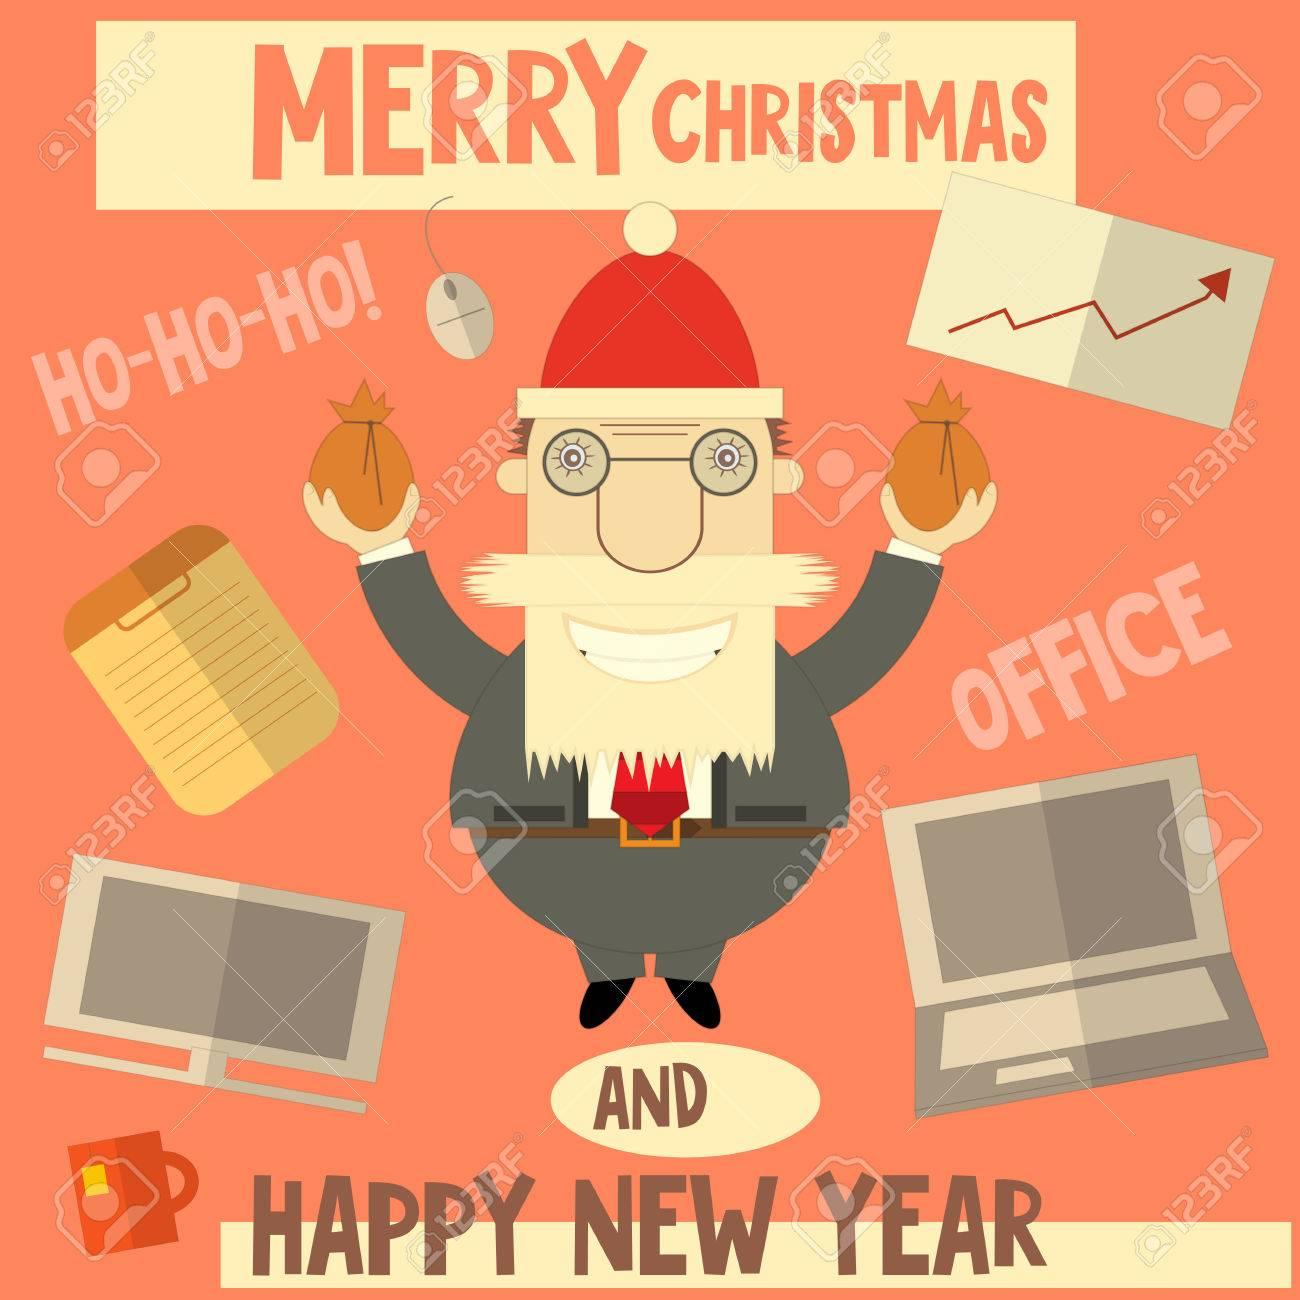 Merry Christmas Boss.Merry Christmas Greeting Card With Cartoon Santa Claus Boss